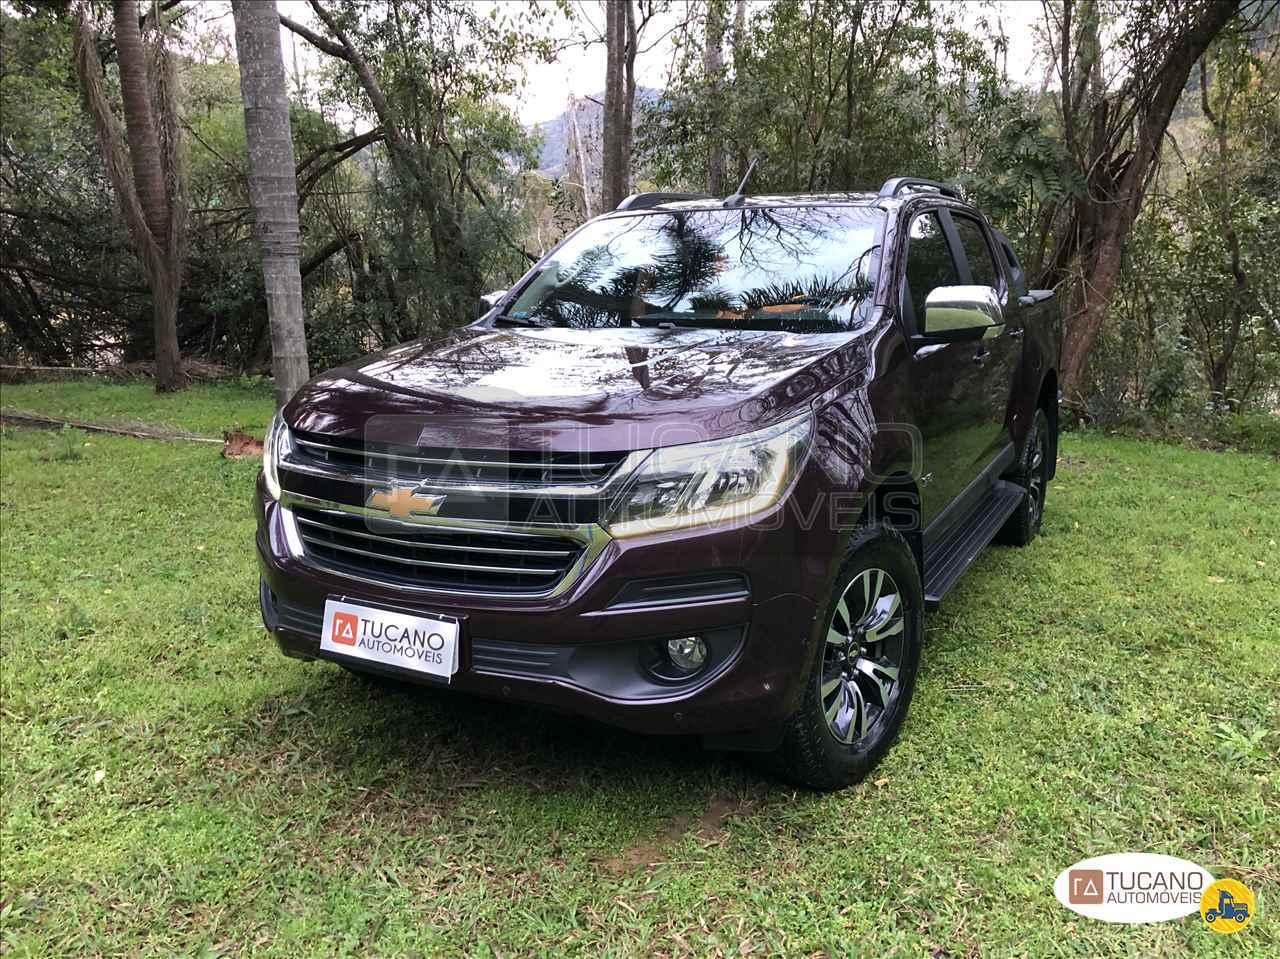 CARRO GM - Chevrolet S10 2.8 CD LTZ Tucano Automóveis ALFREDO WAGNER SANTA CATARINA SC